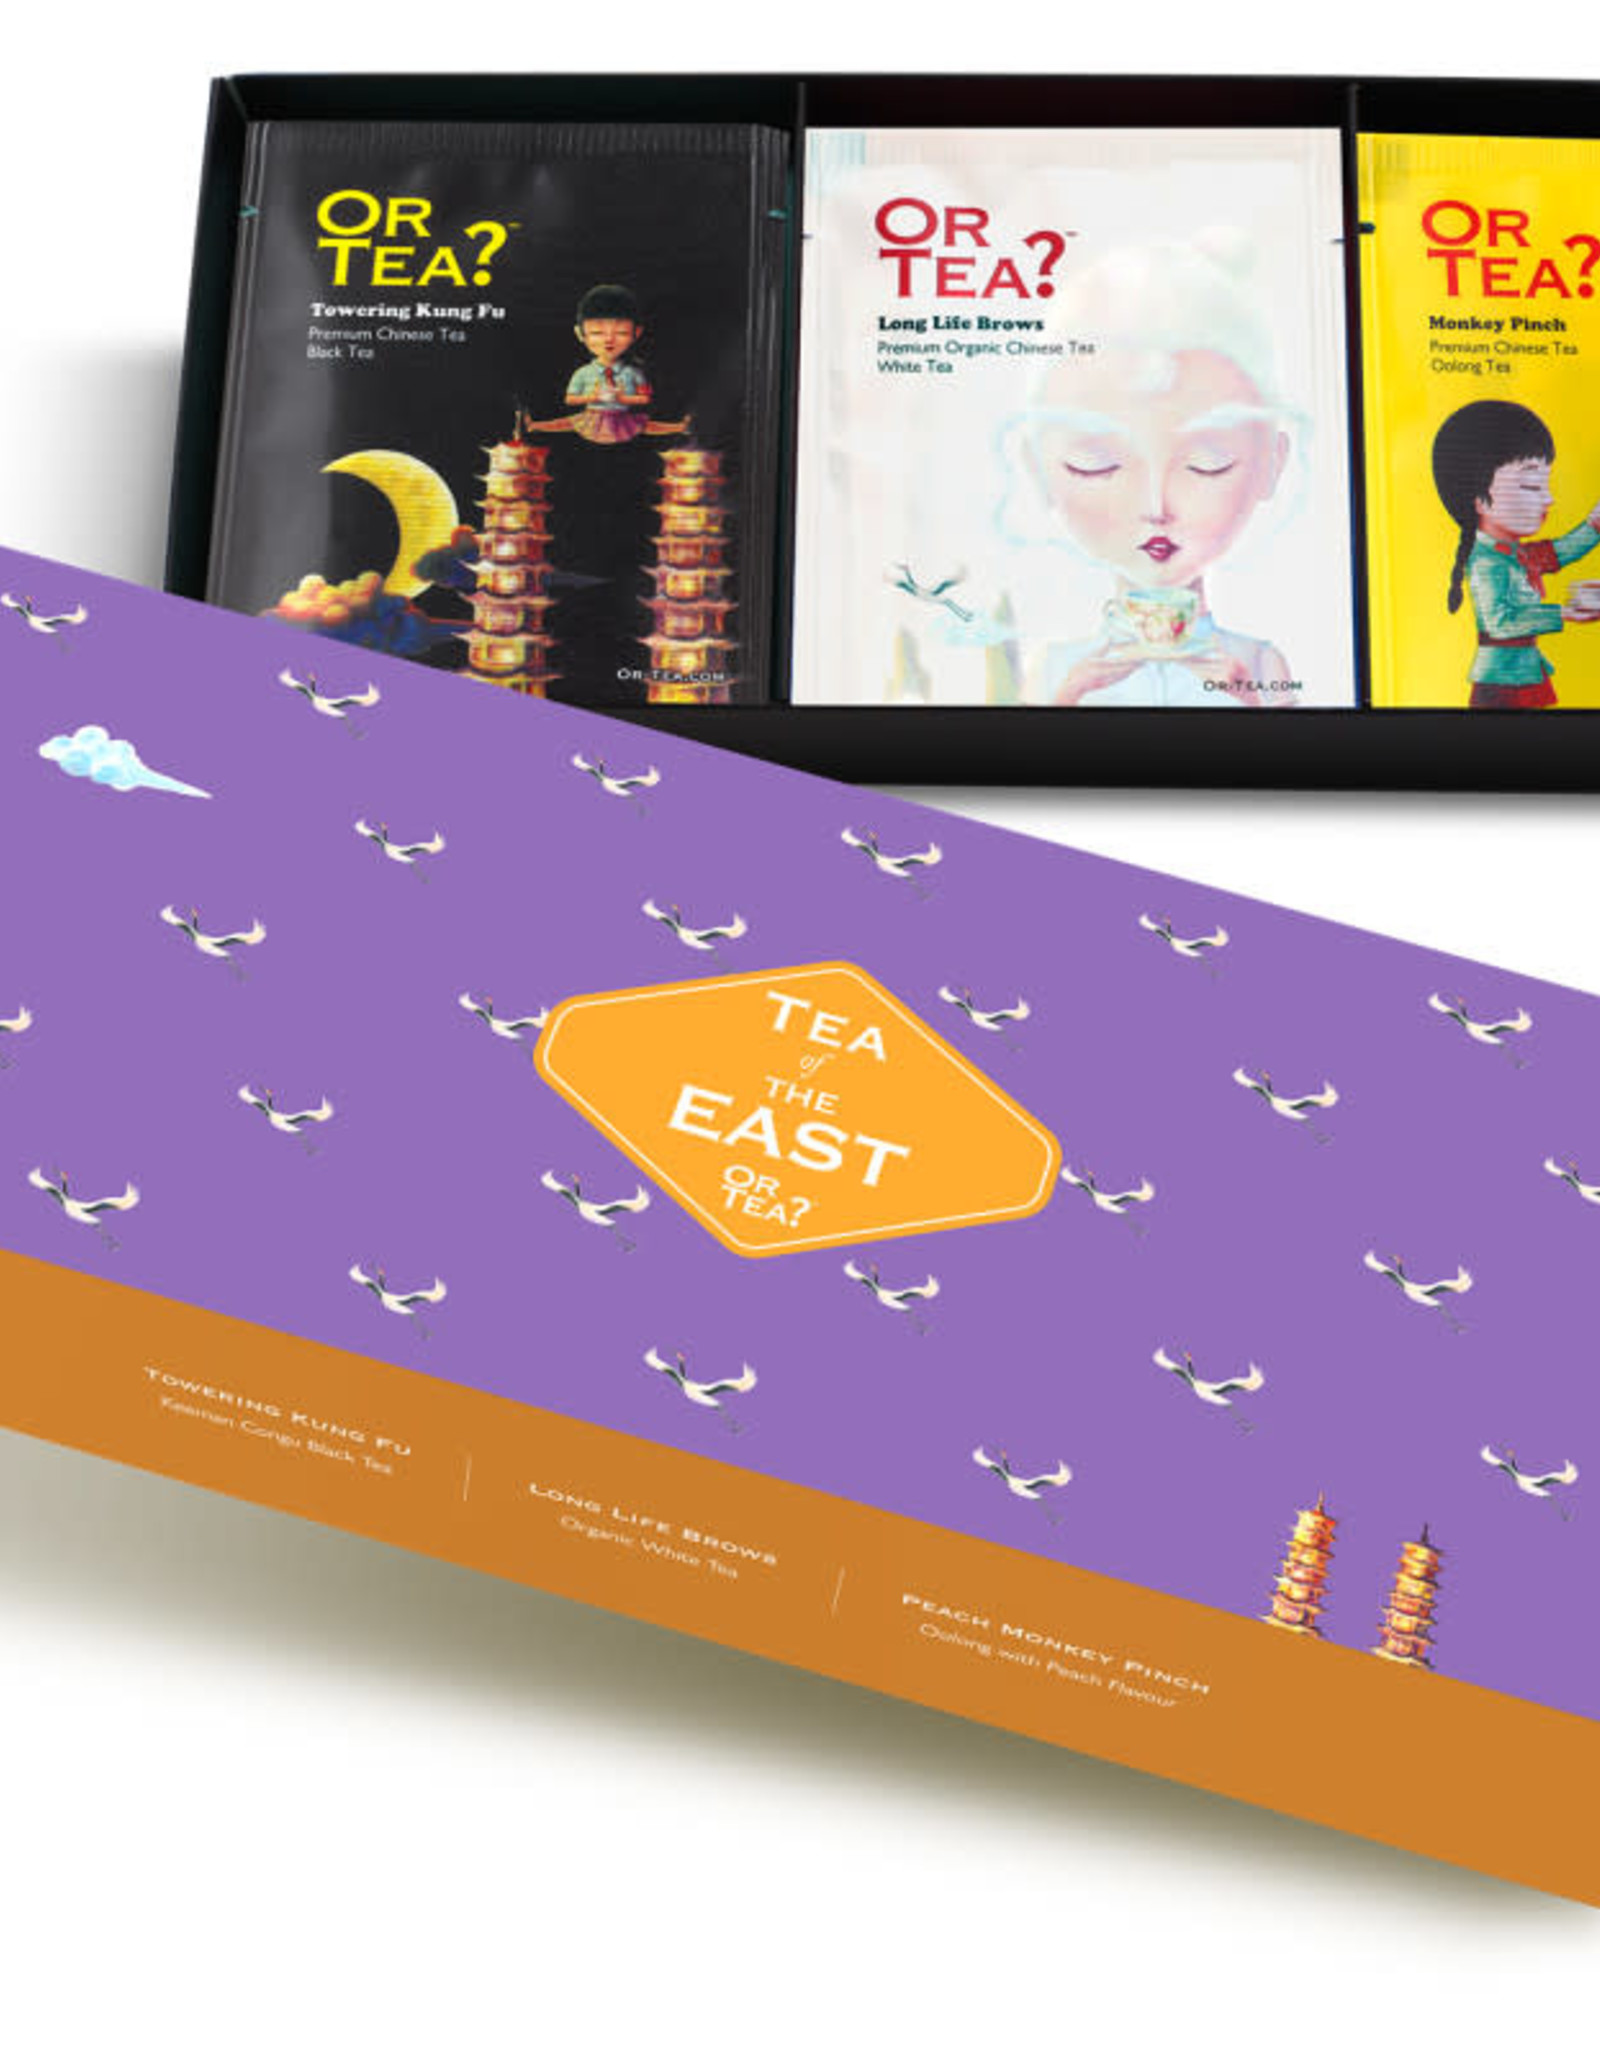 Or tea? or tea? 3-in-1 sachet combo - Tea of the east